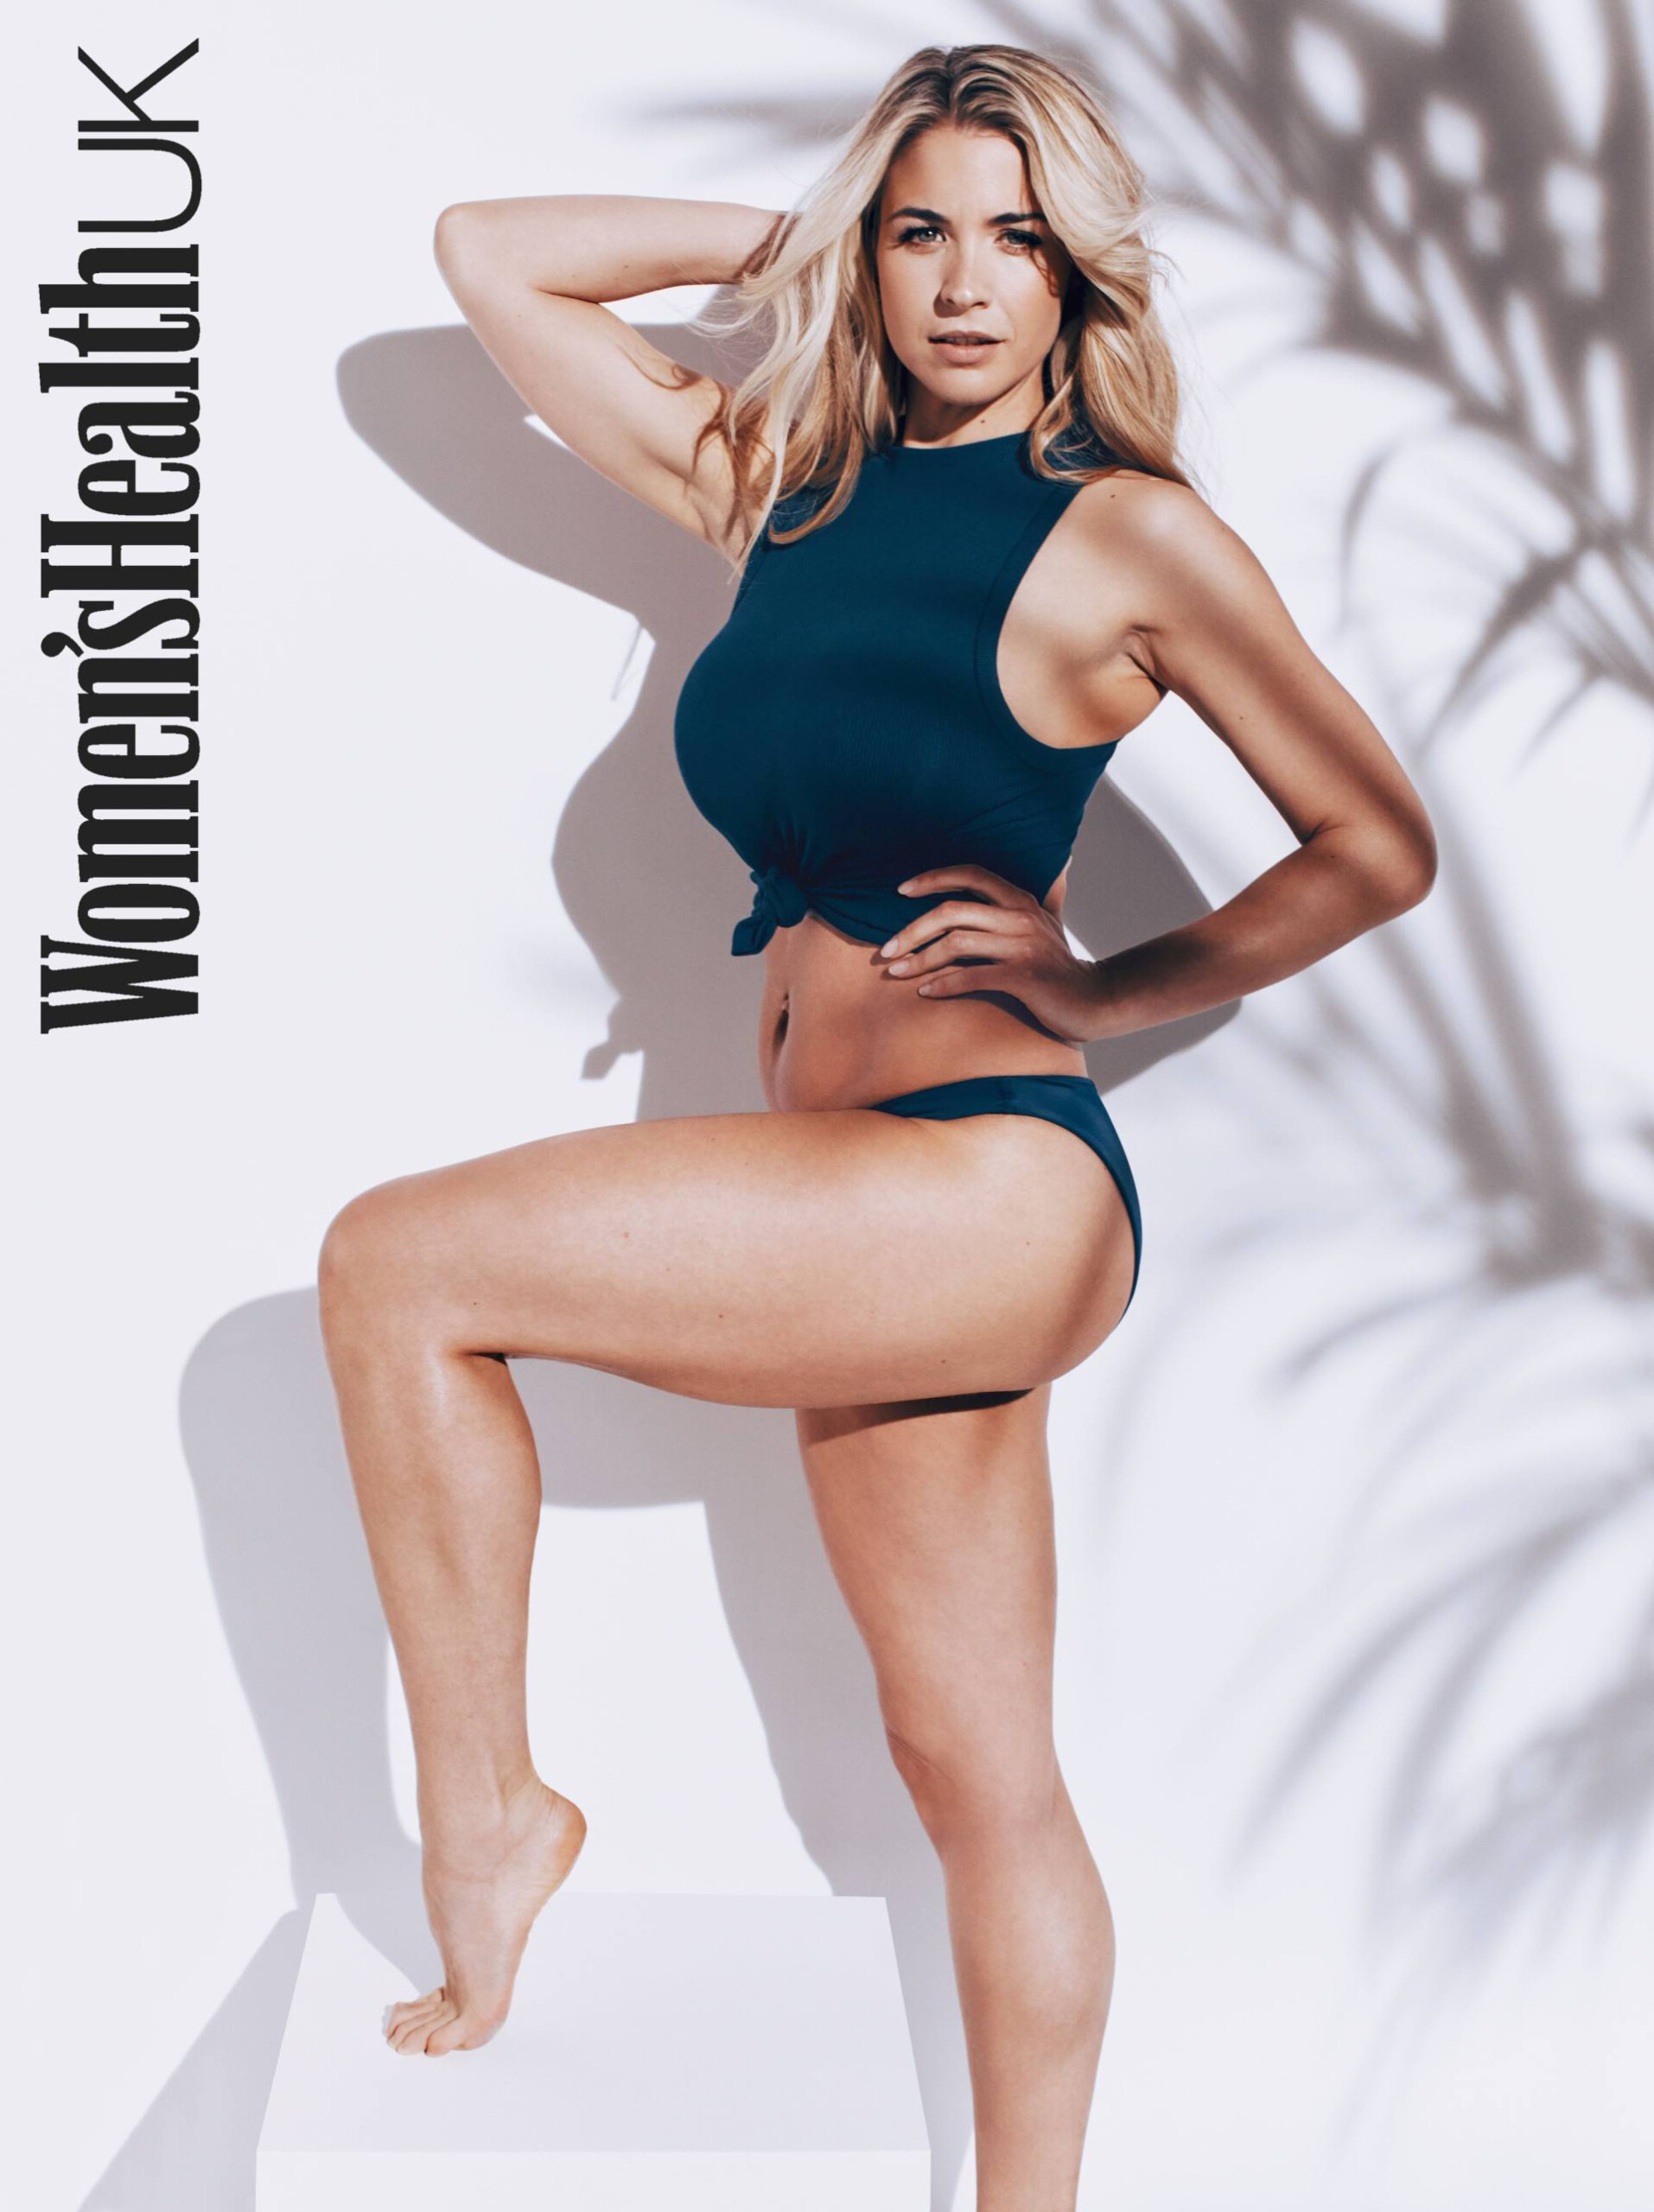 Gemma Atkinson Sexy Photoshoot